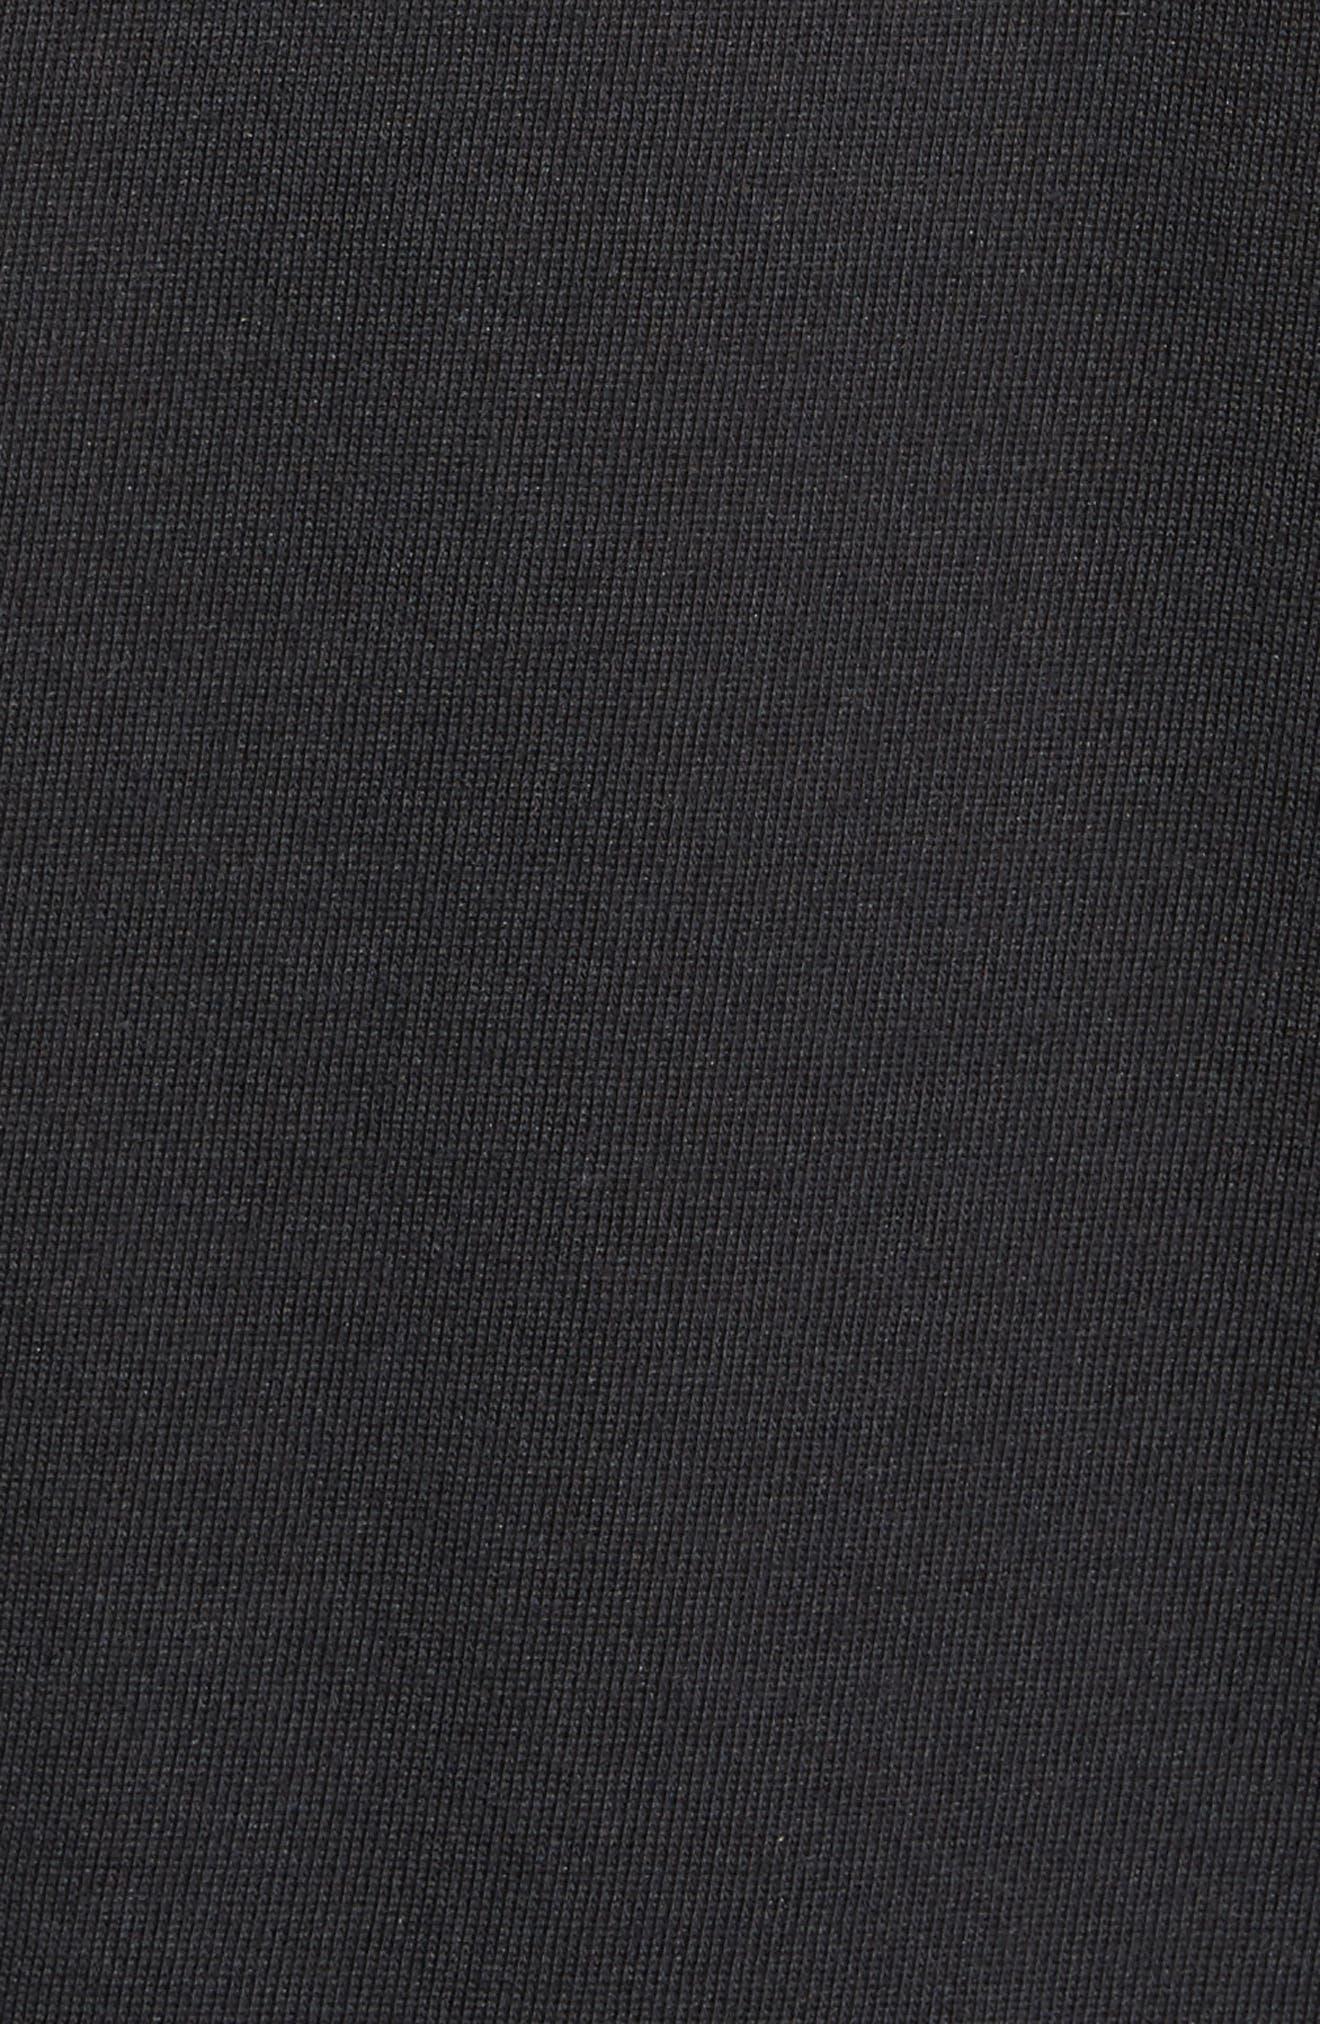 Control Dri-FIT T-Shirt,                             Alternate thumbnail 5, color,                             Black (00A)